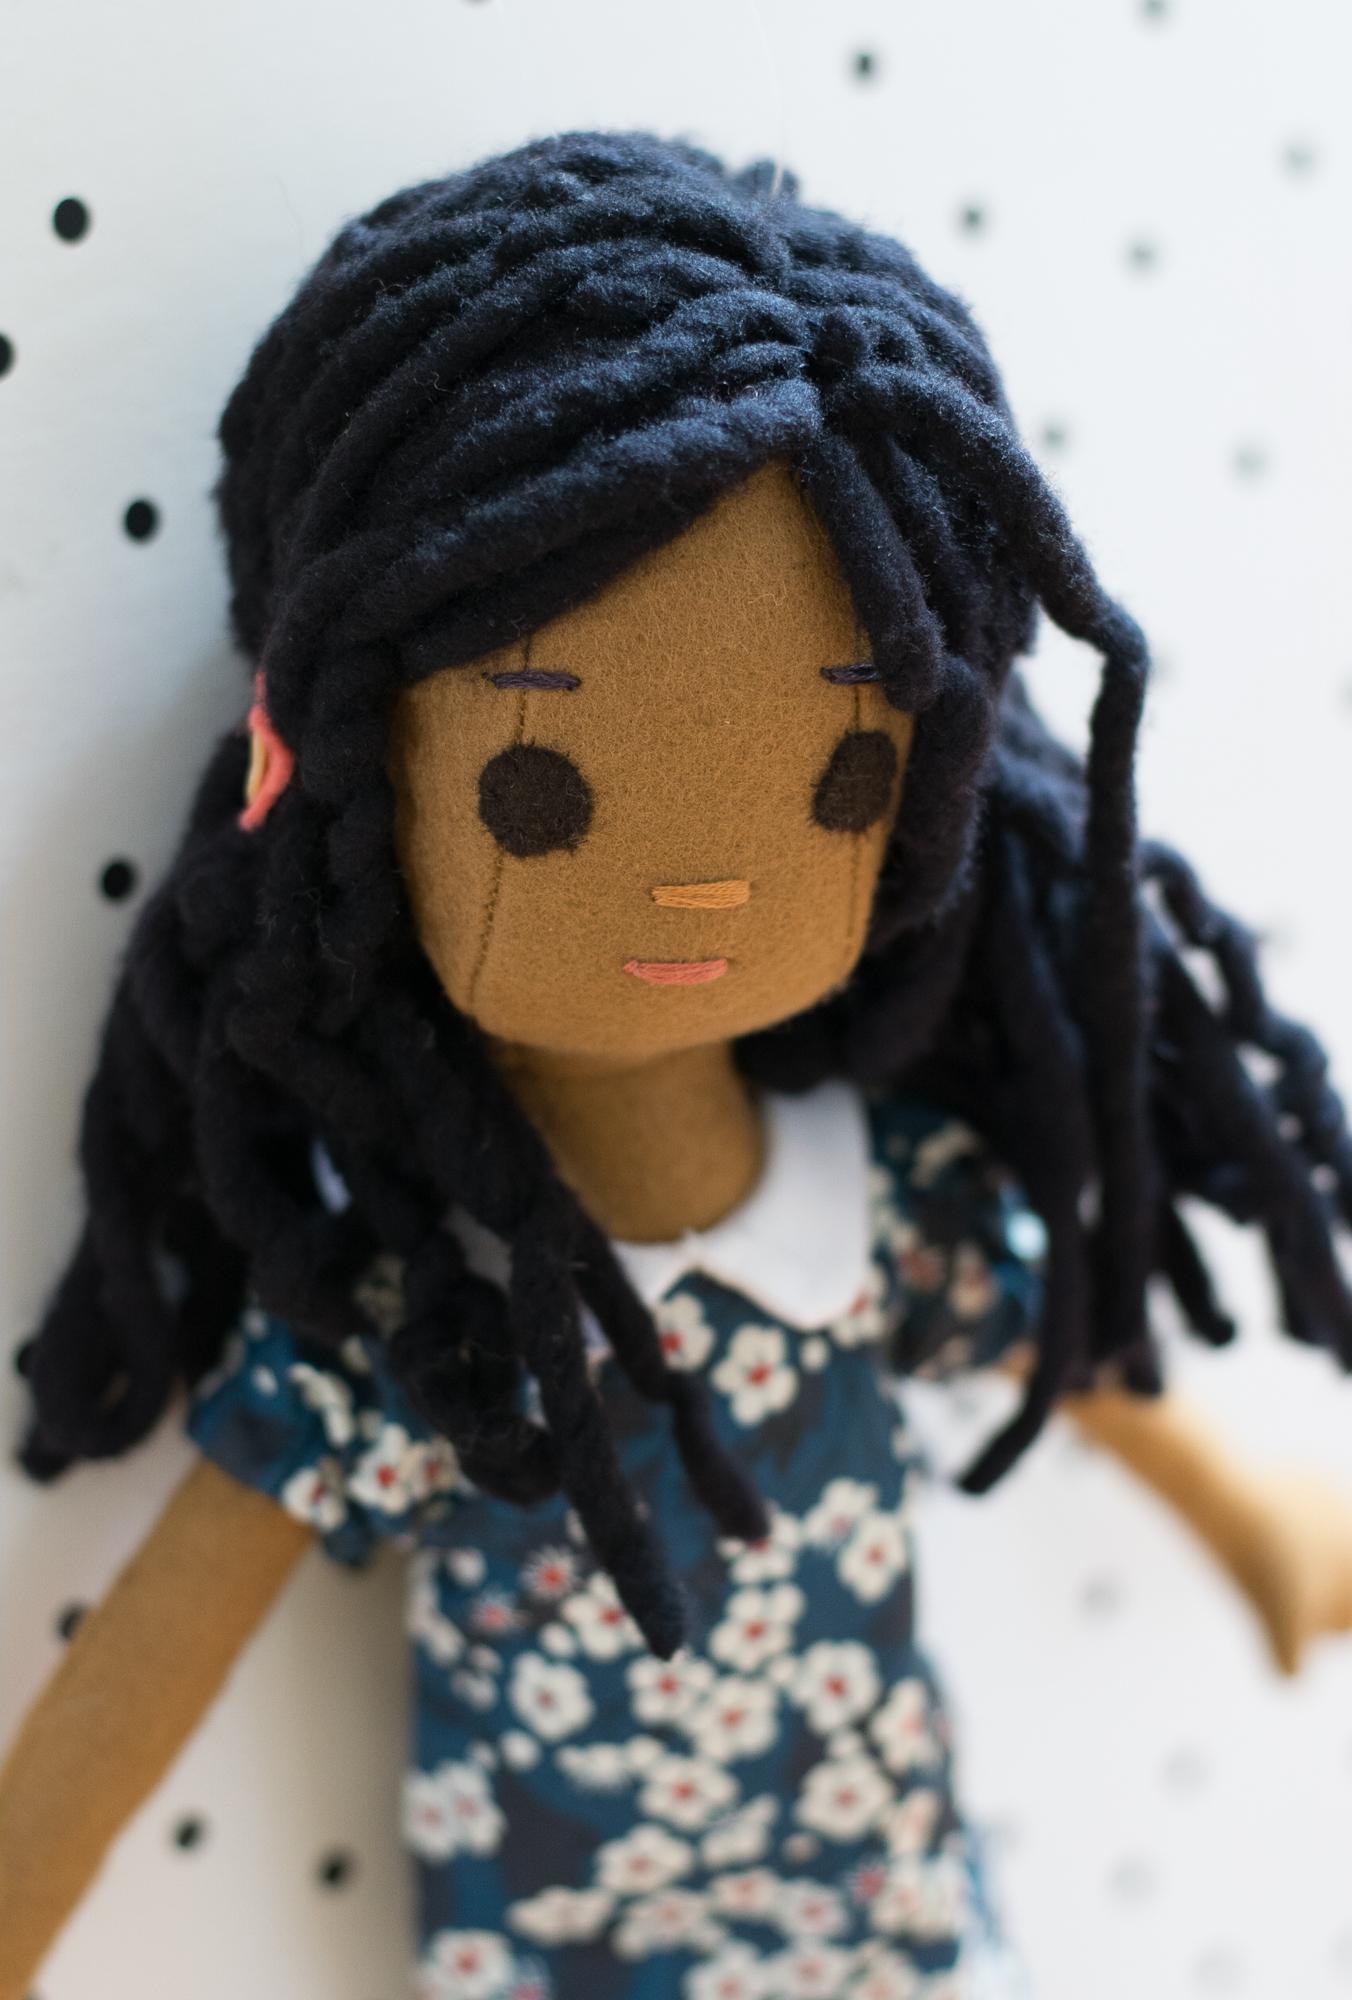 Gallery of Dolls-1.jpg